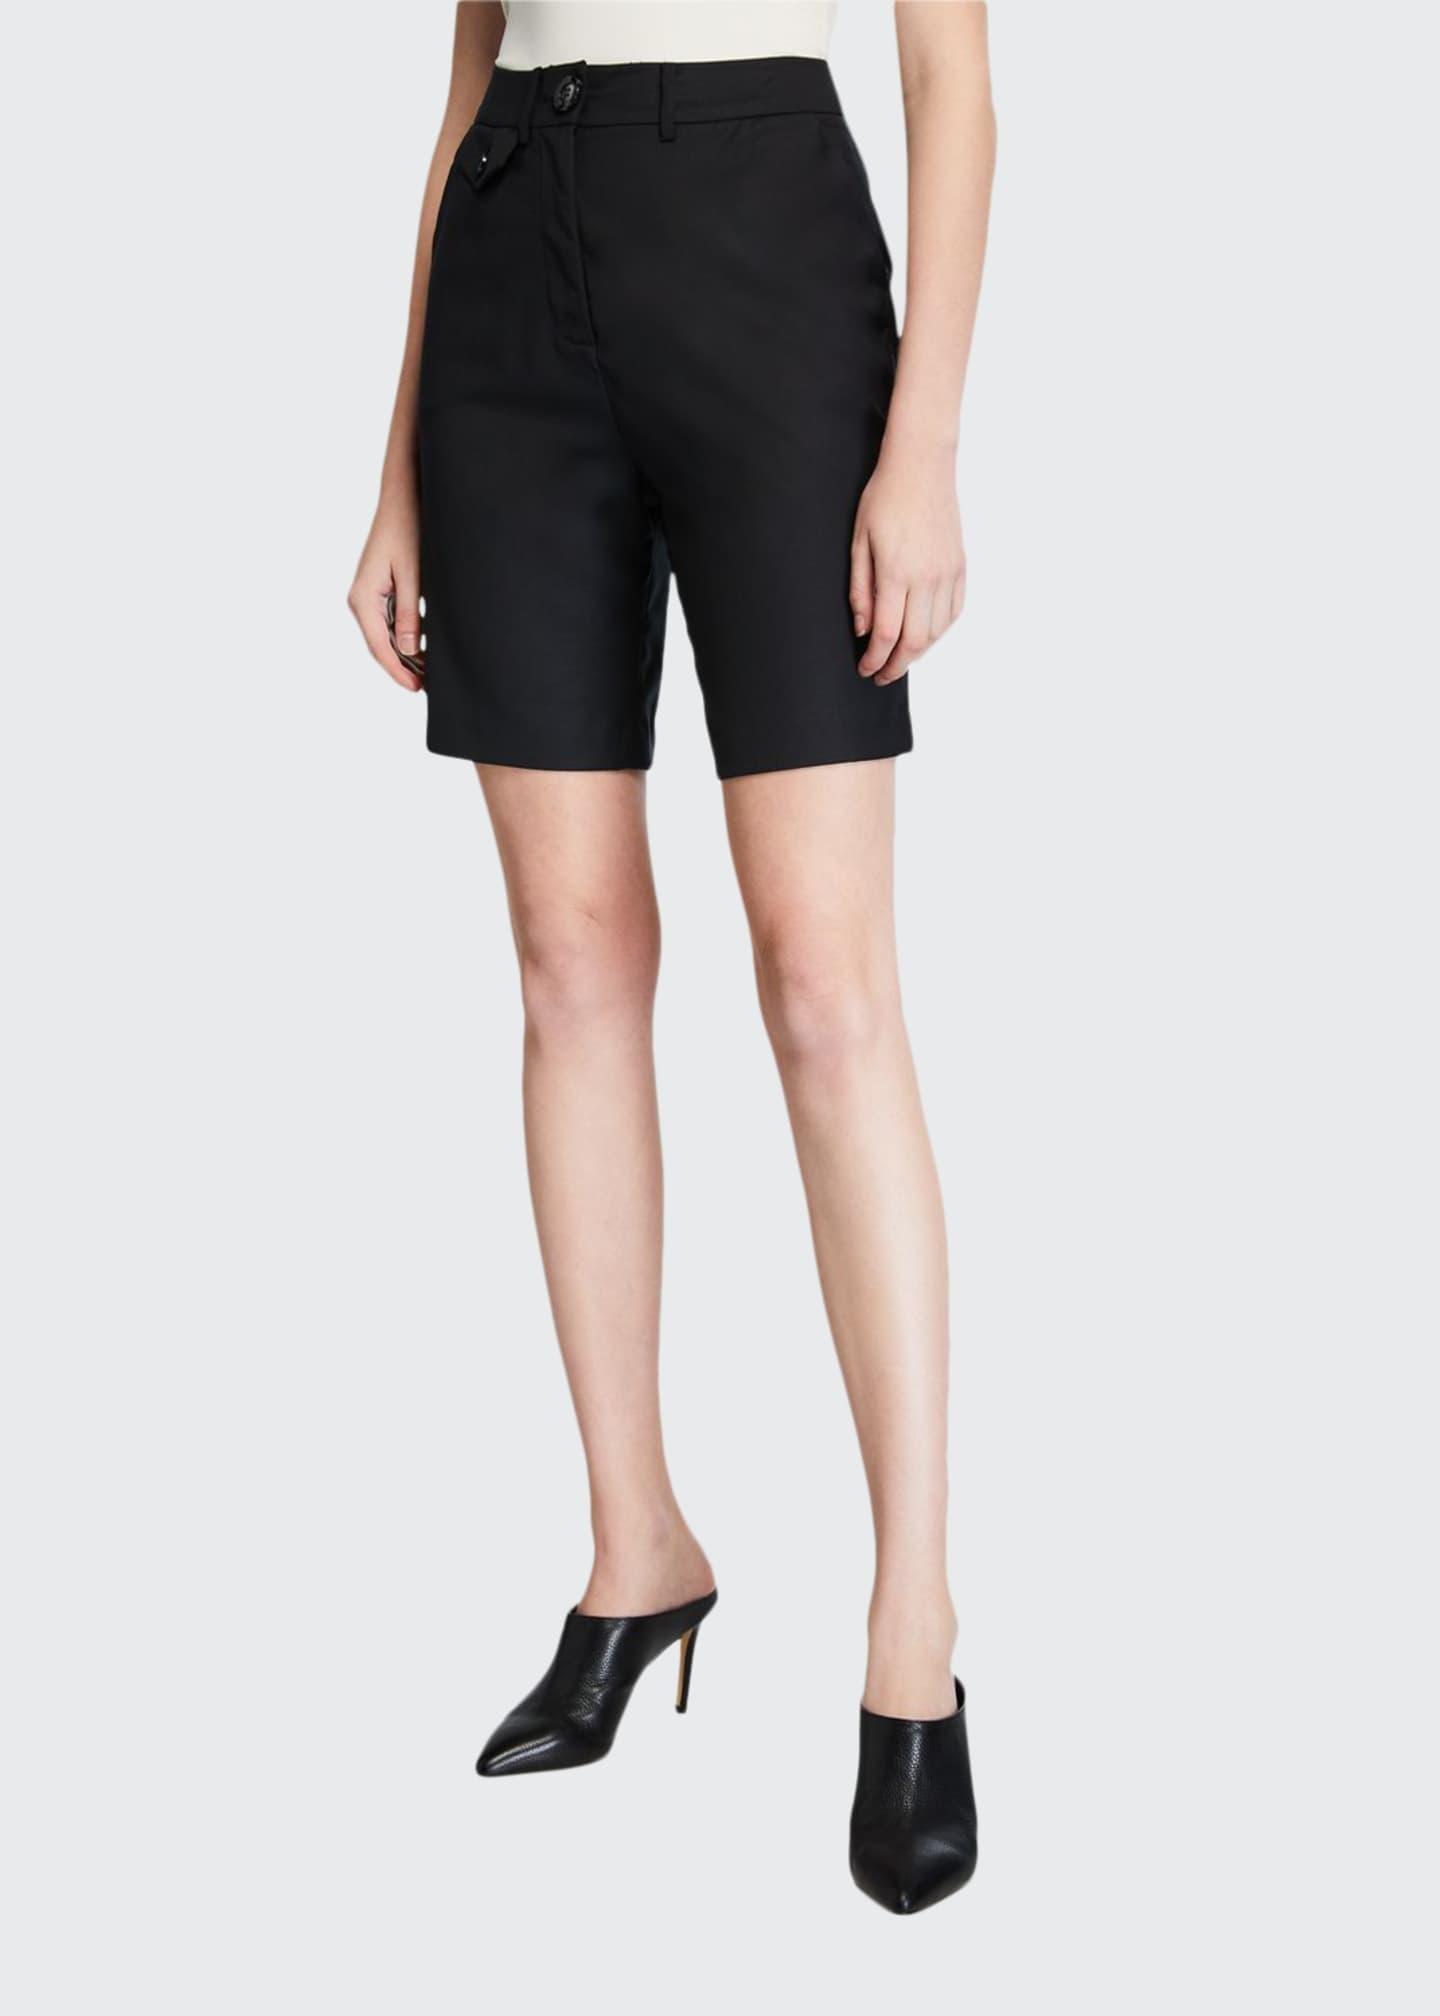 Anna Quan Patsy Bermuda Shorts